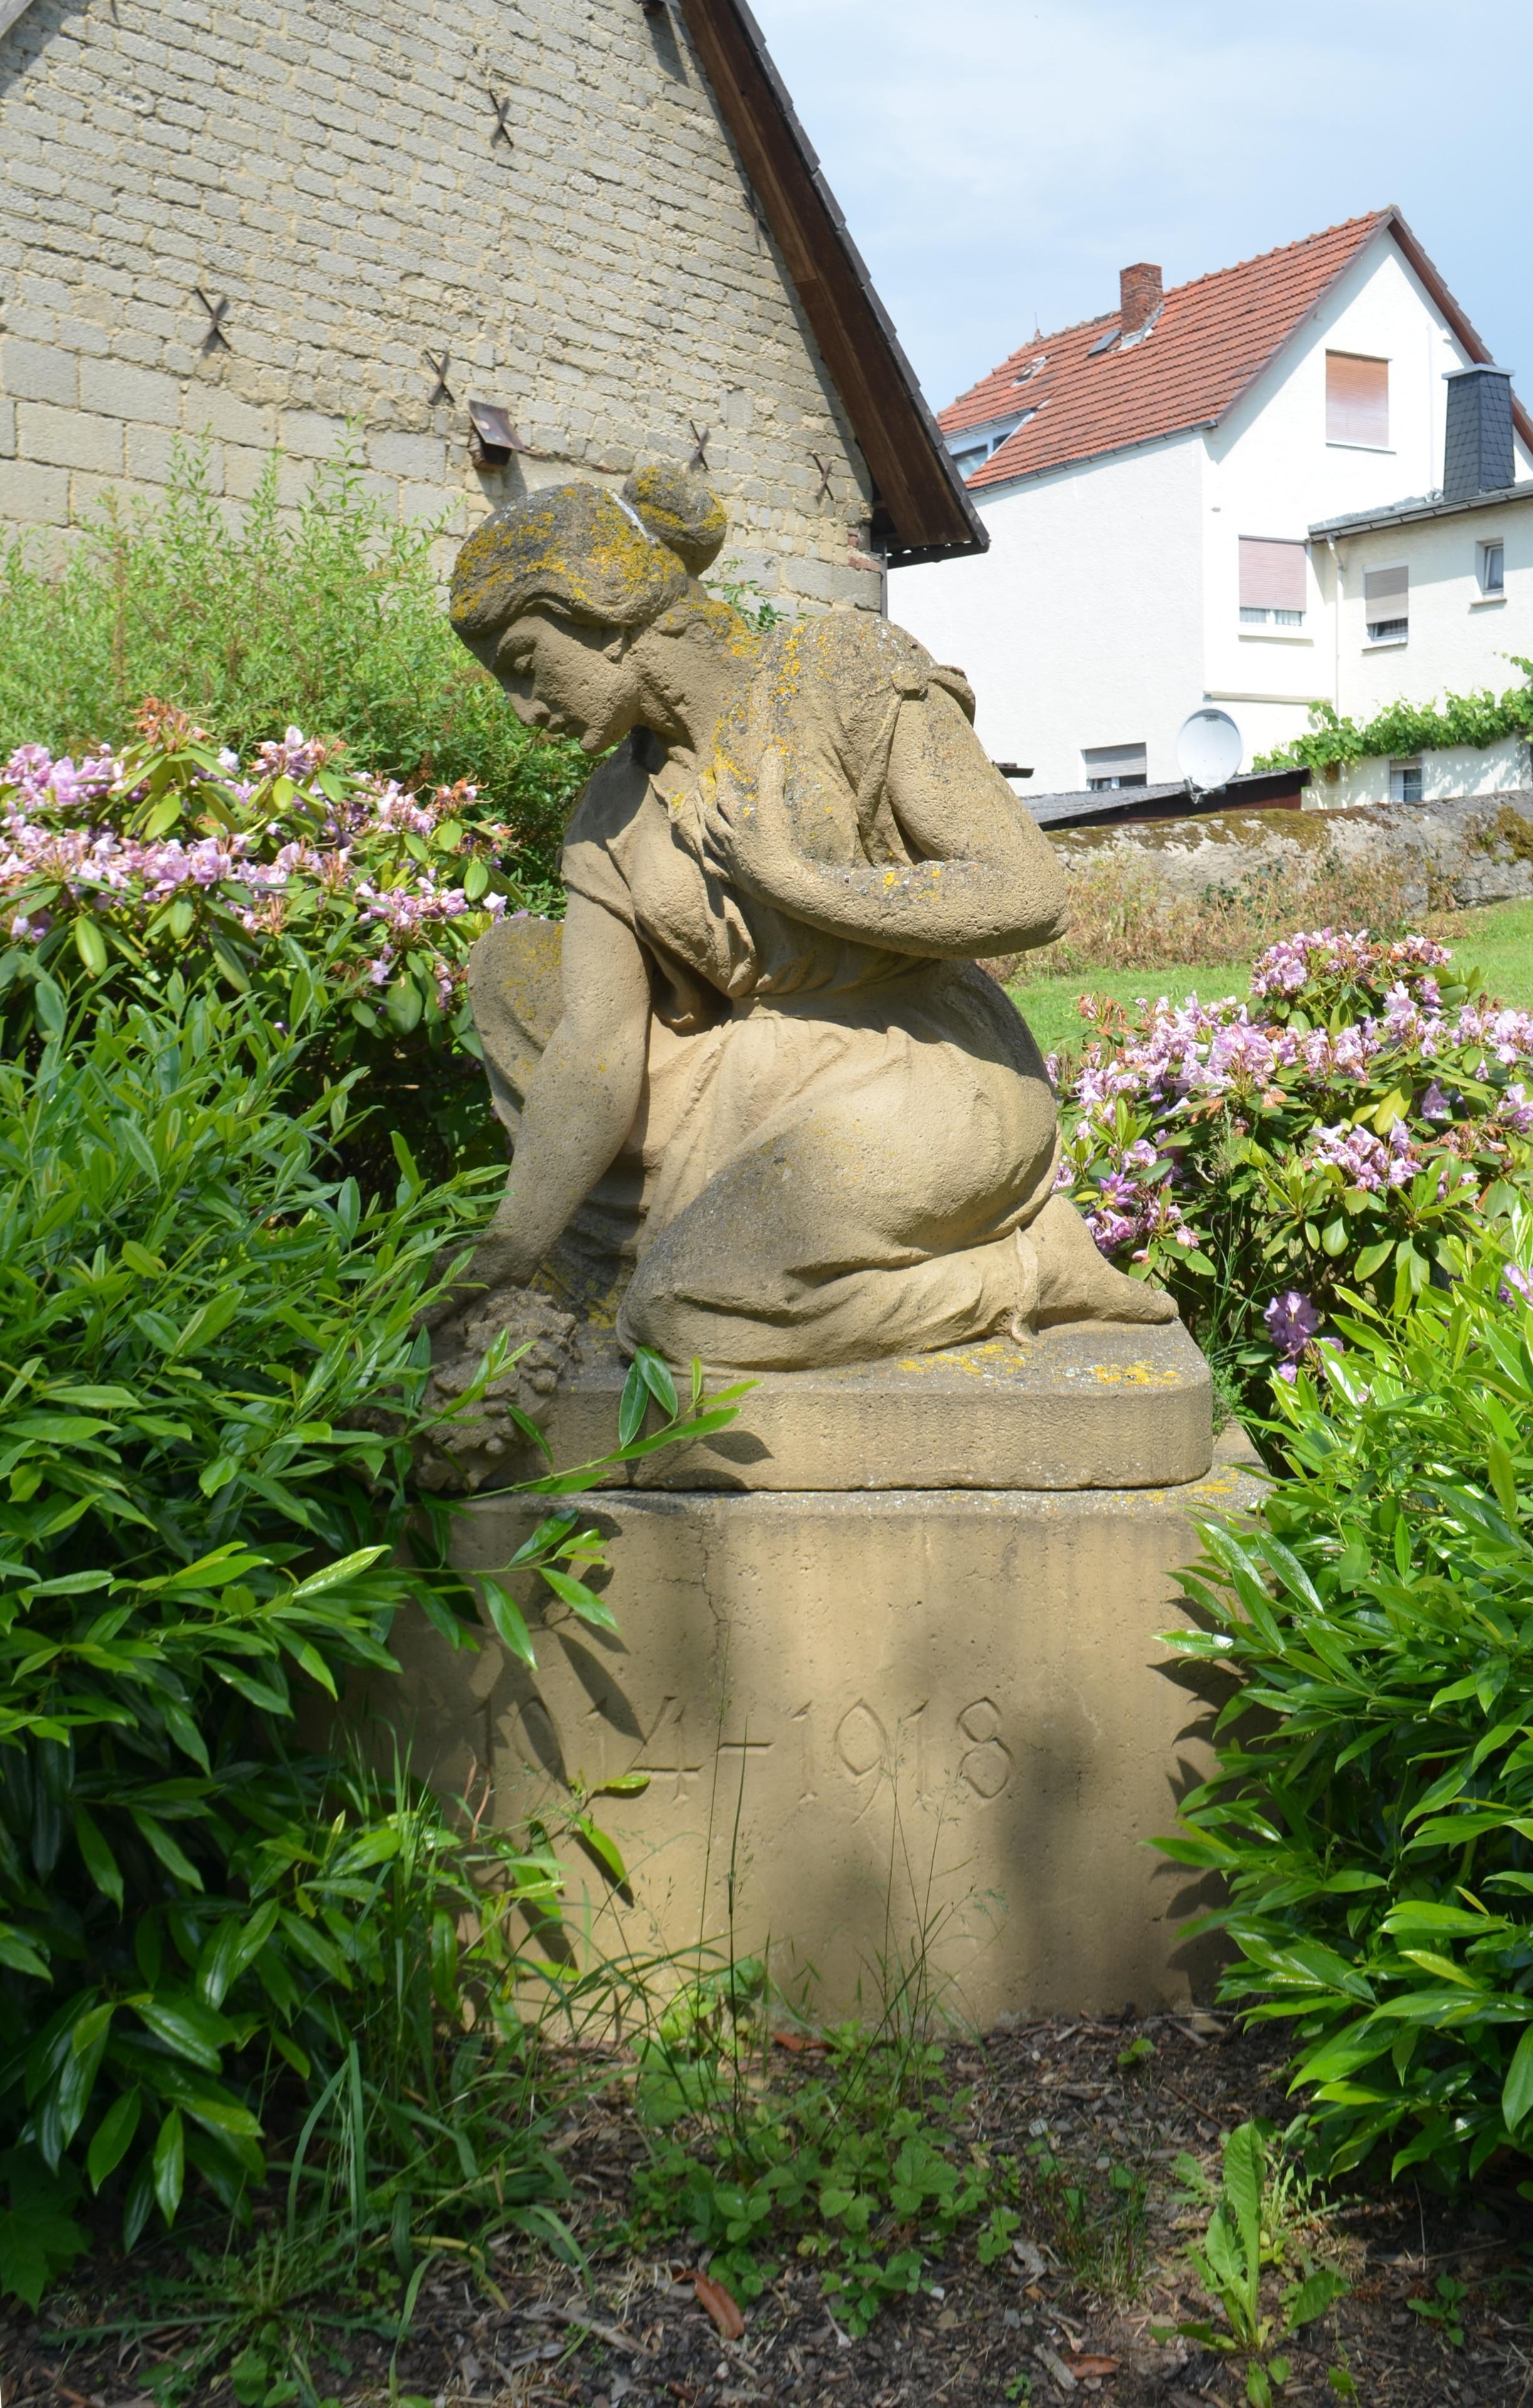 Lahn-Dill-Kreis District, Hessen, Germany